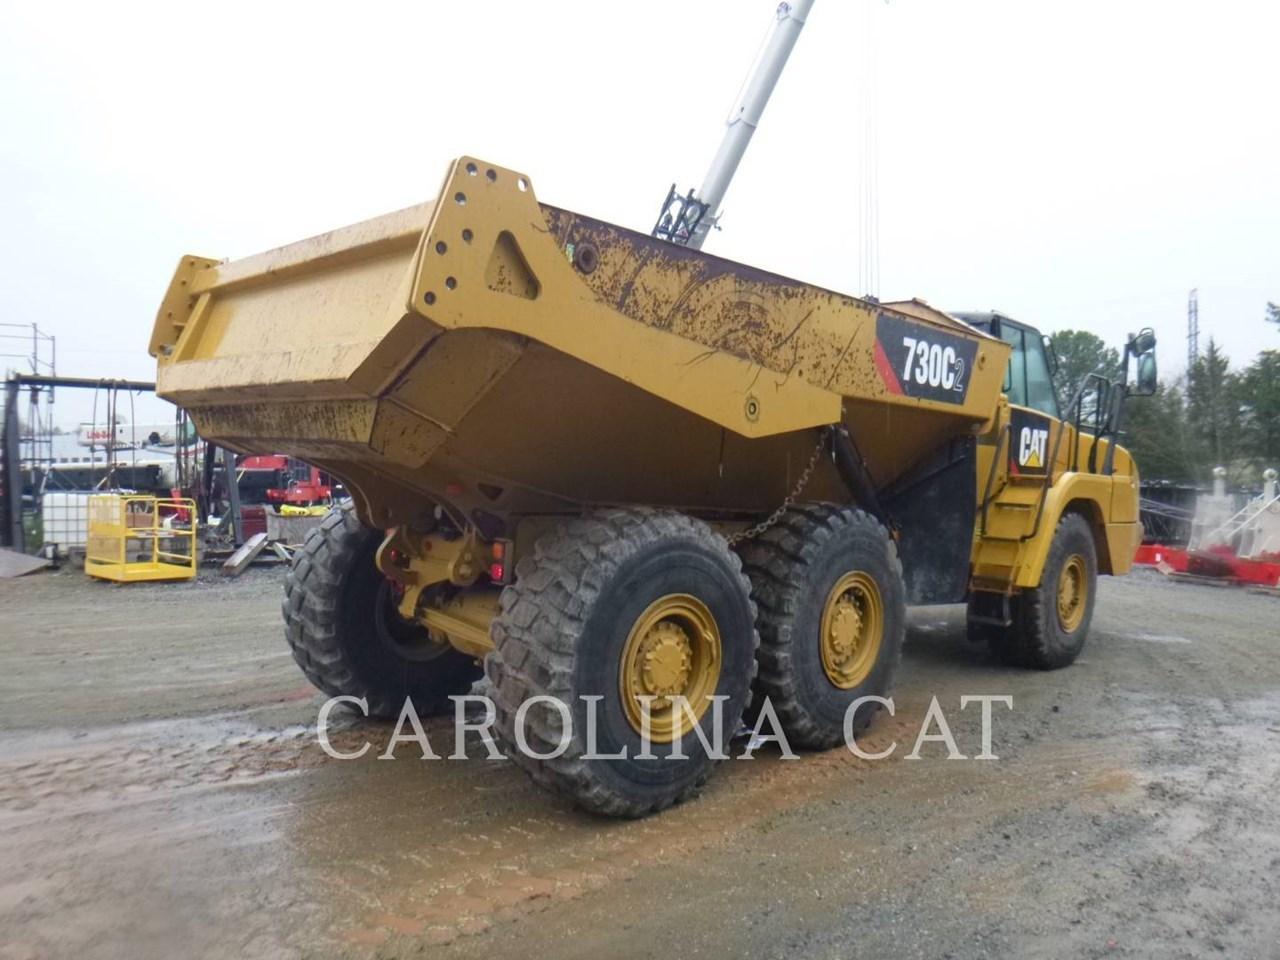 2018 Caterpillar 730C2 TG Image 3